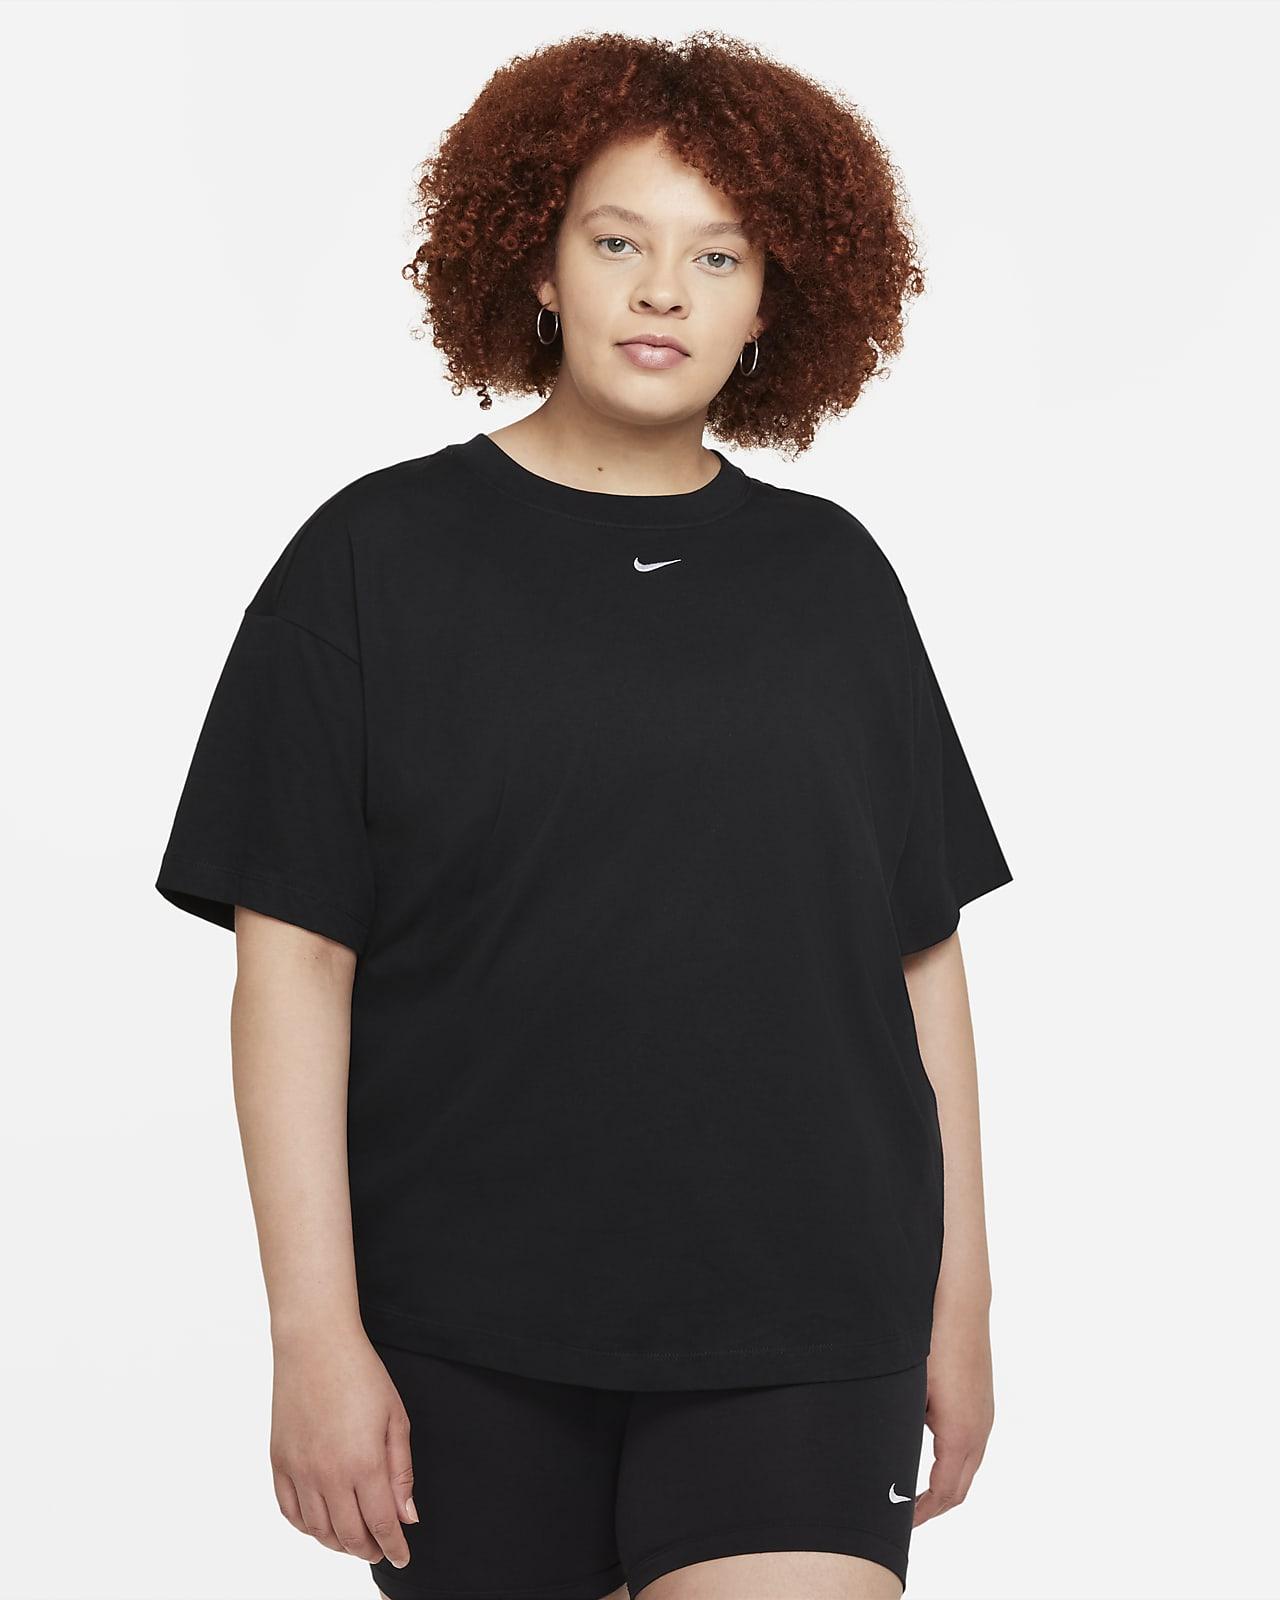 Haut à manches courtes oversize Nike Sportswear Essential pour Femme (grande taille)